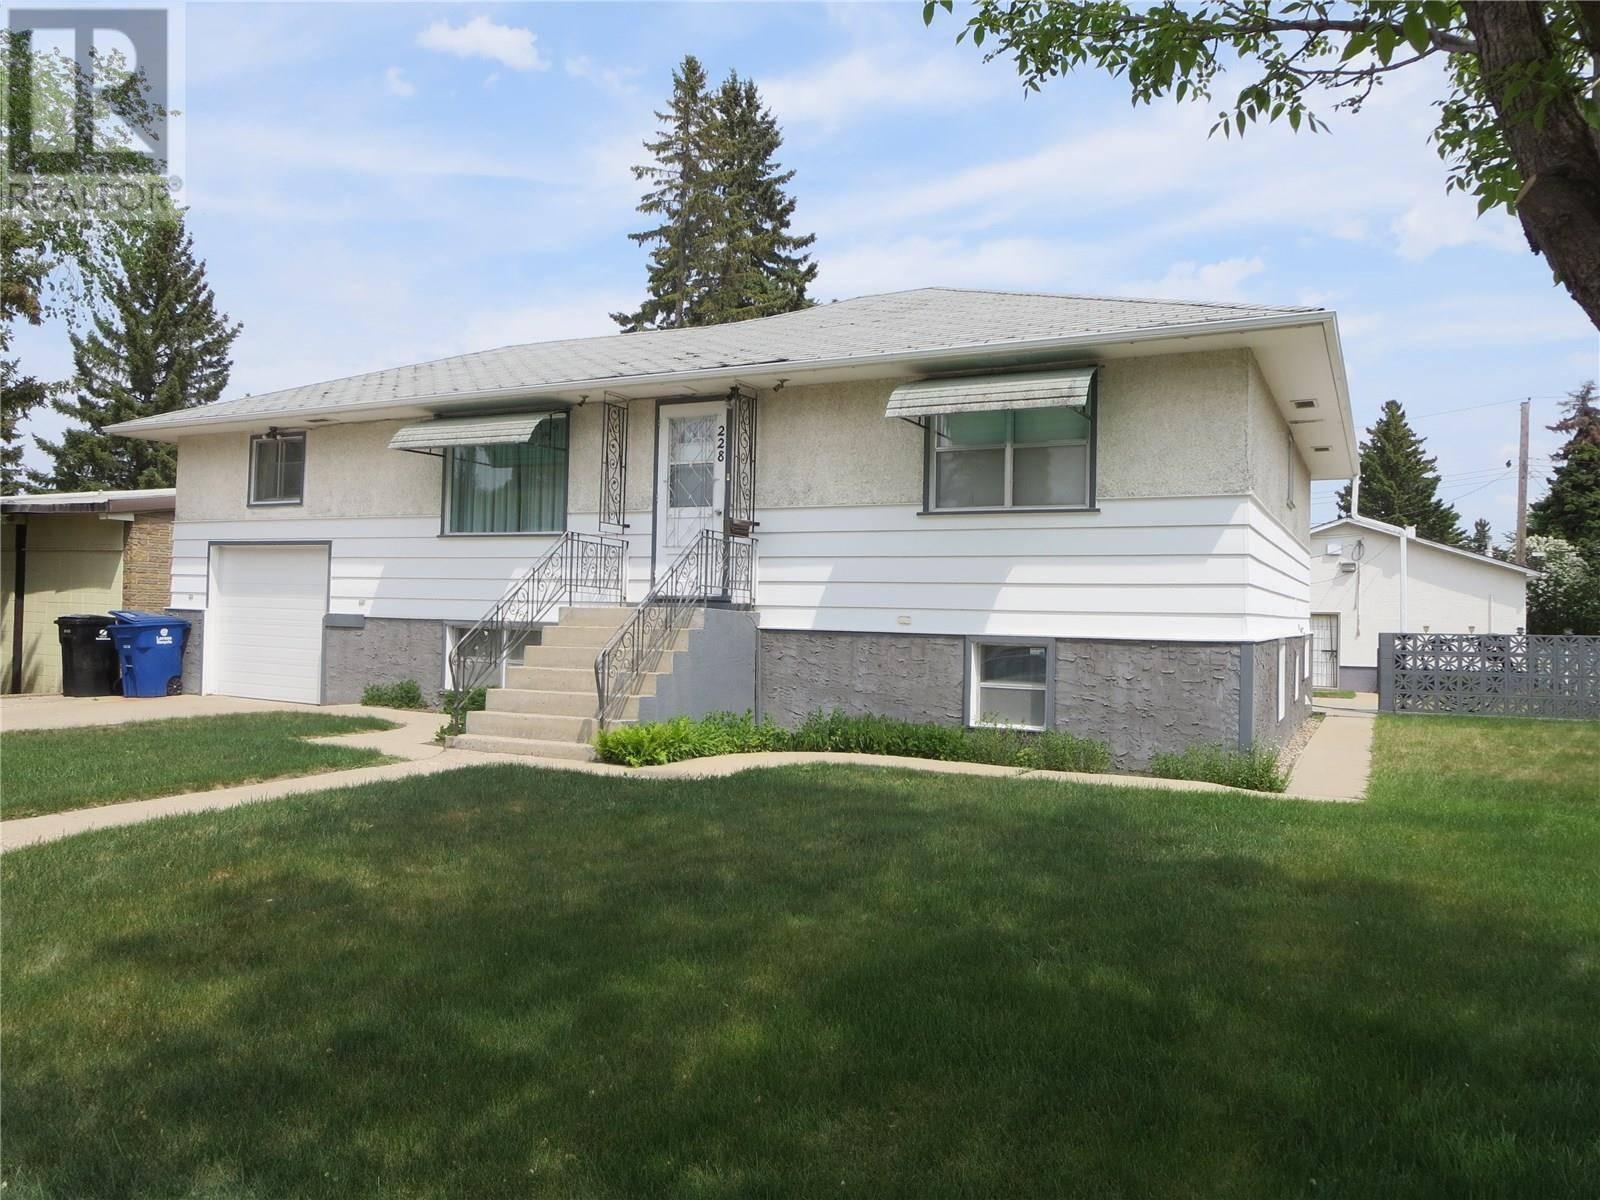 House for sale at 228 V Ave N Saskatoon Saskatchewan - MLS: SK787010